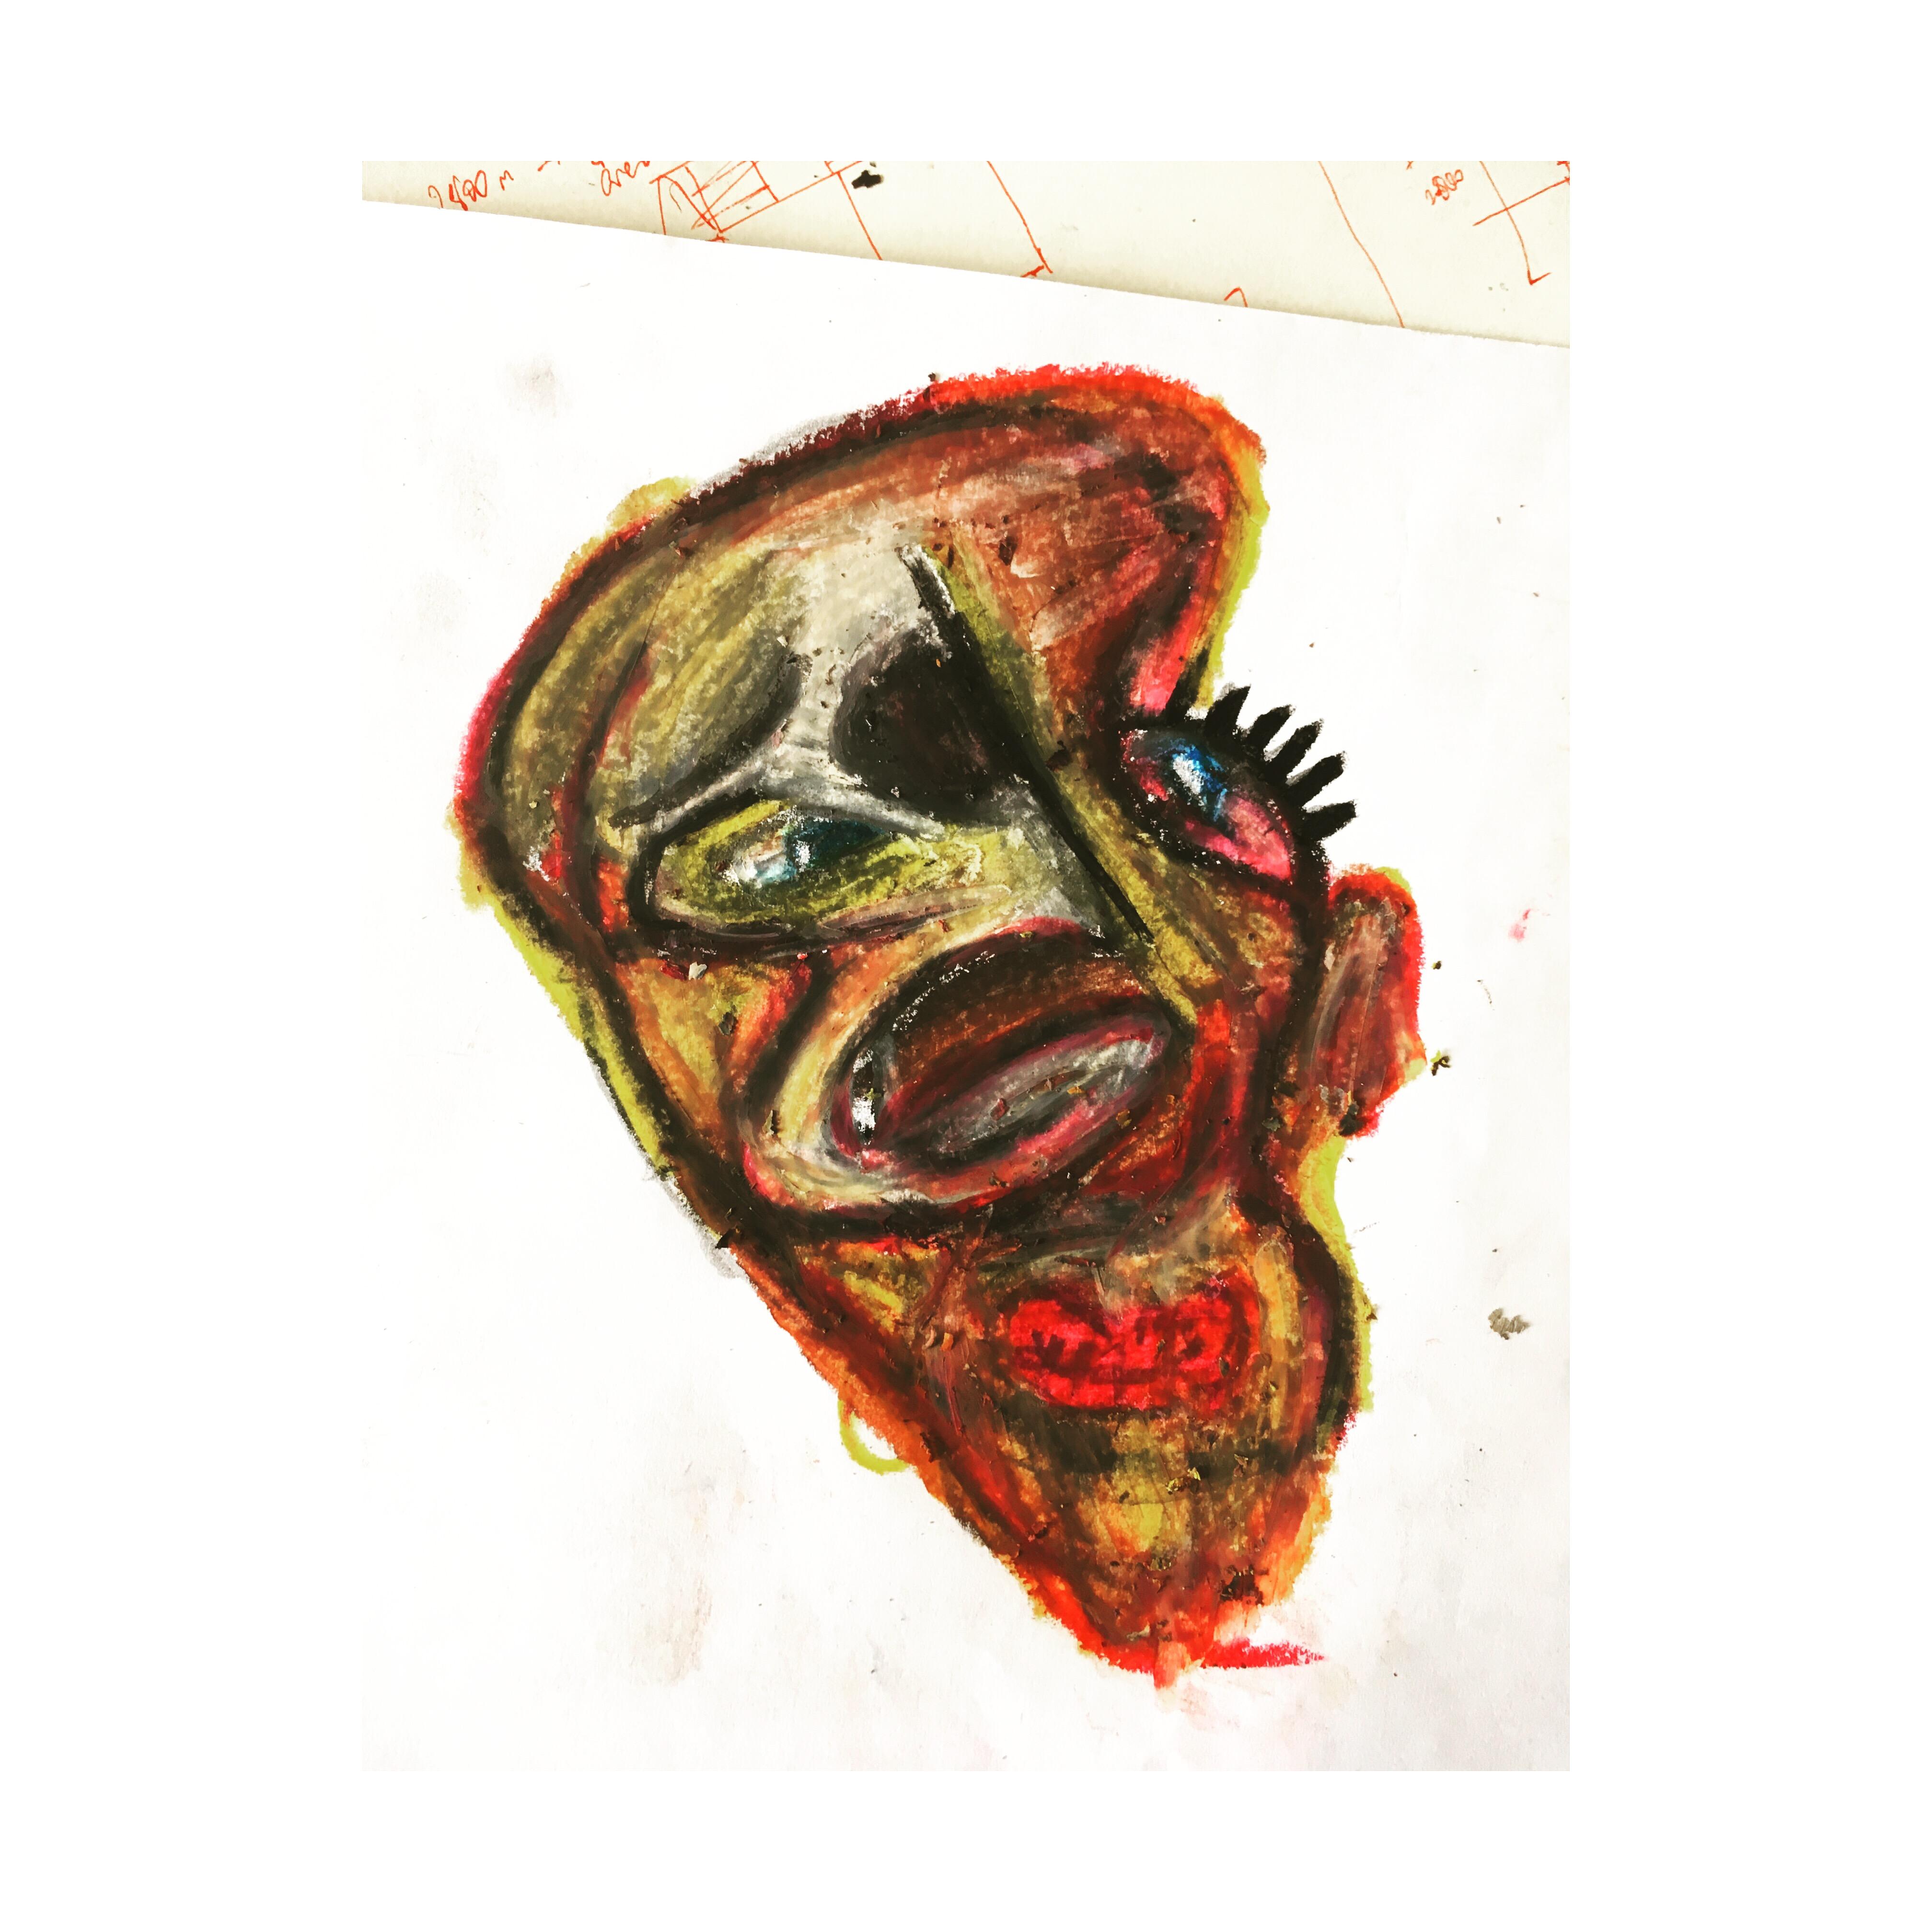 Bacon Face Study II